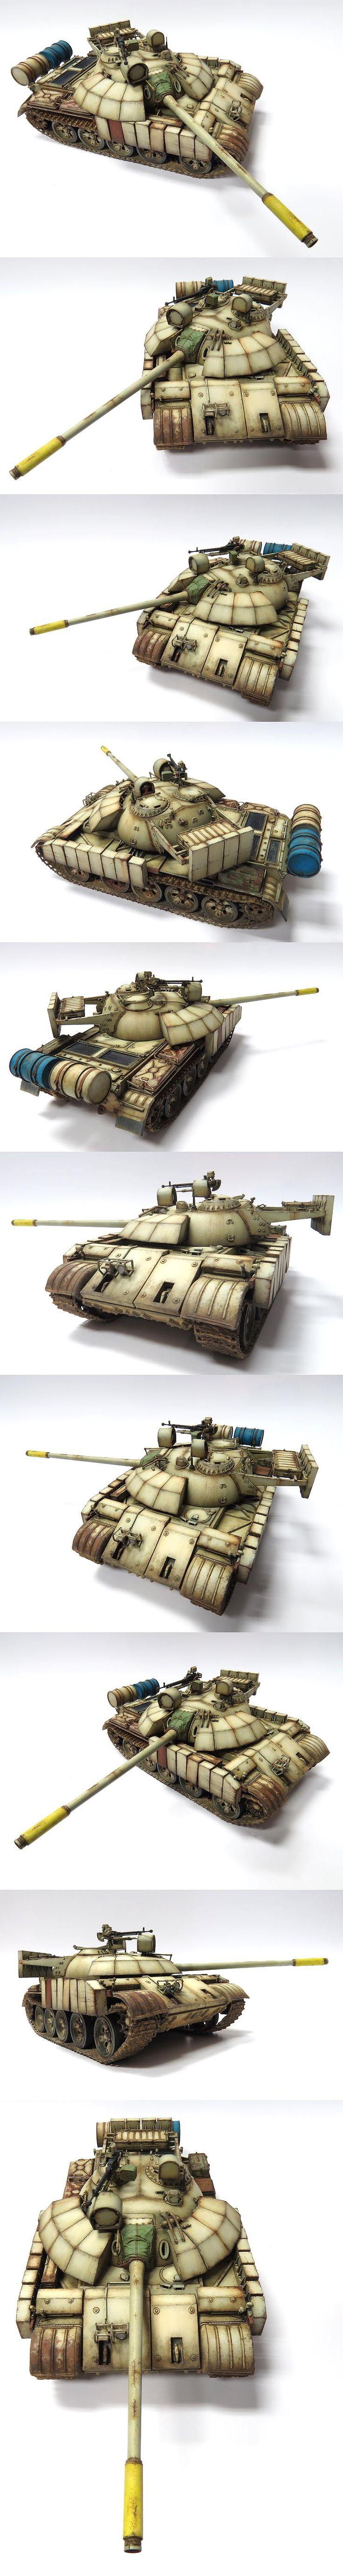 T55 Enigma Model by ***NEOFAUX*** M STUDIO Artist since 2009 Model kit: TAMIYA Scale: 1/35